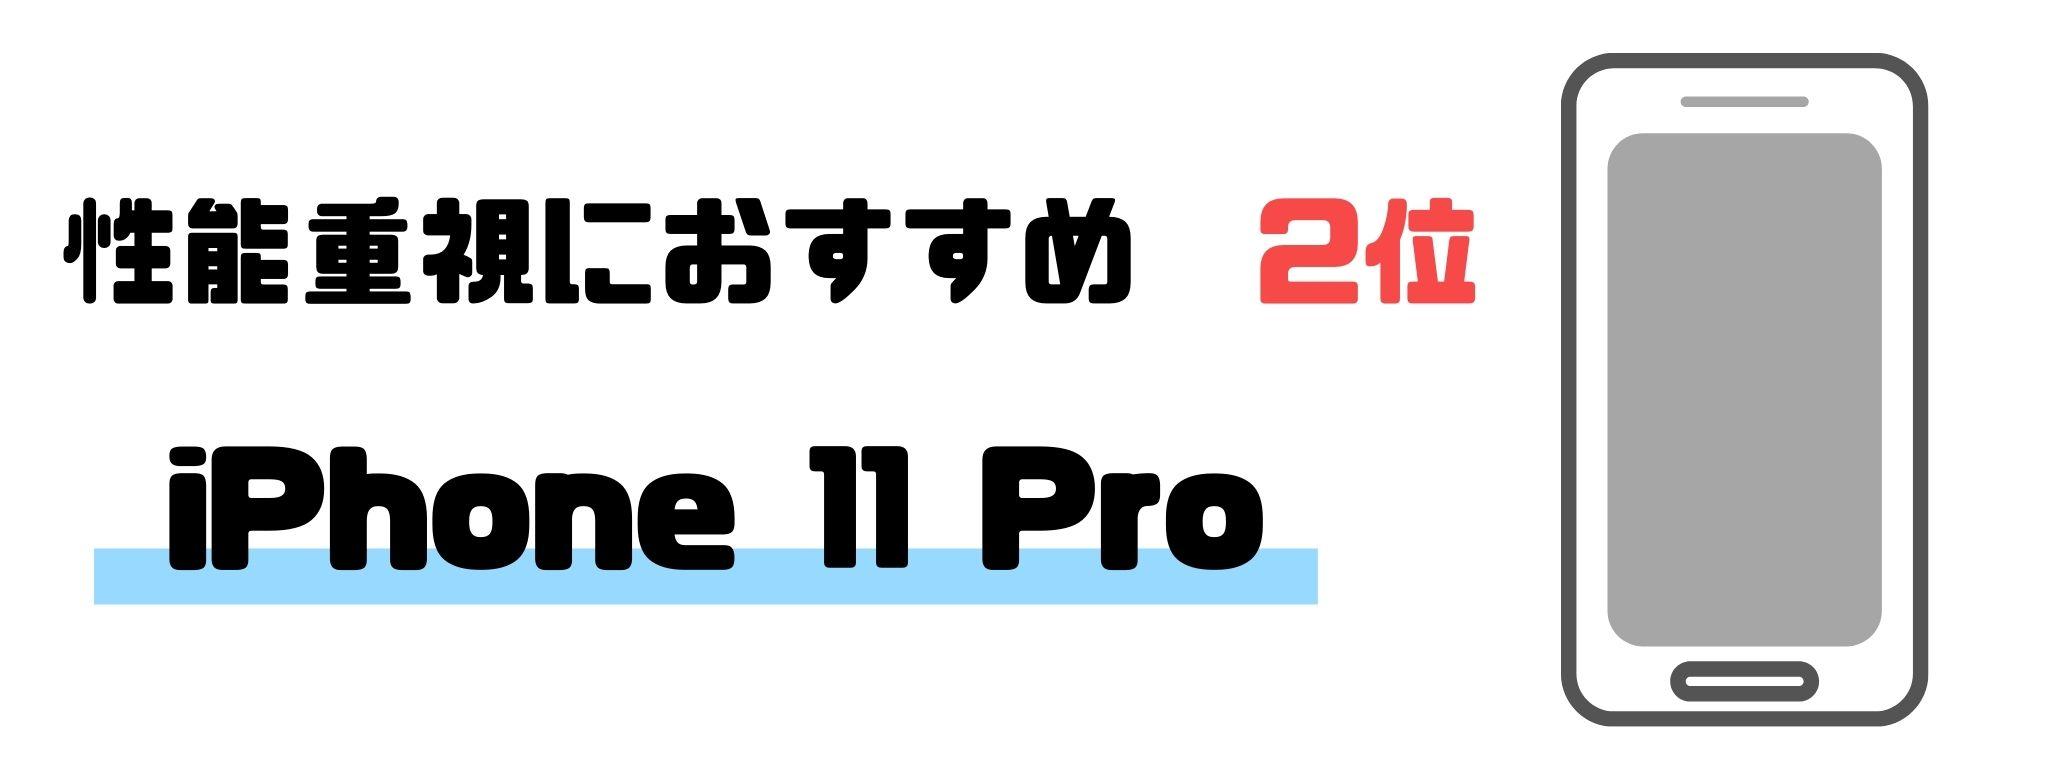 iPhone_おすすめ_性能2